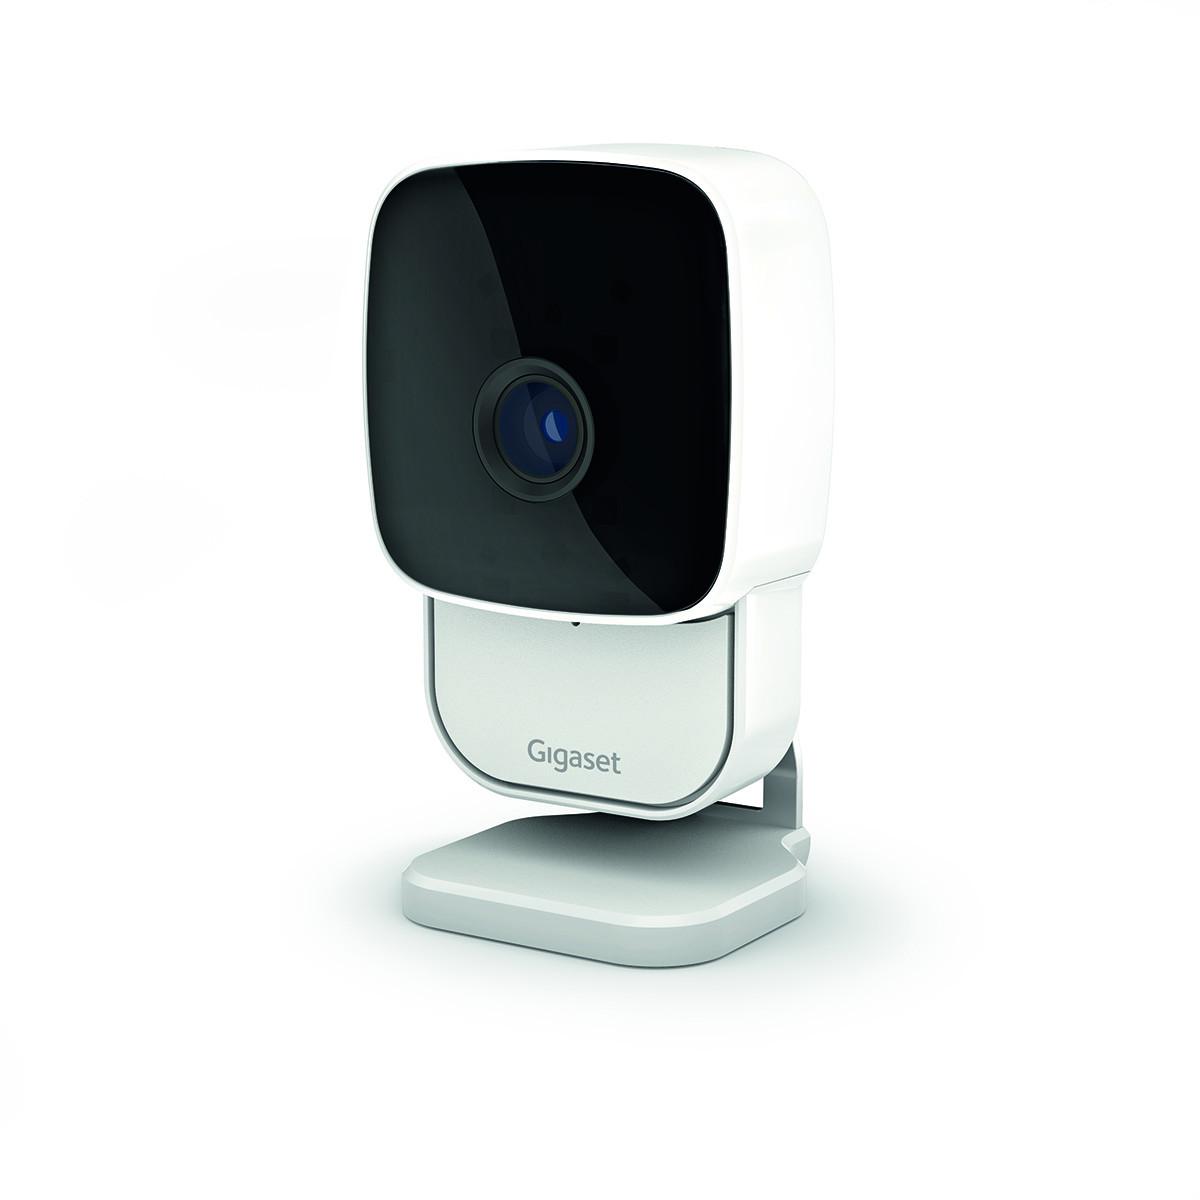 Gigaset Camera 2.0